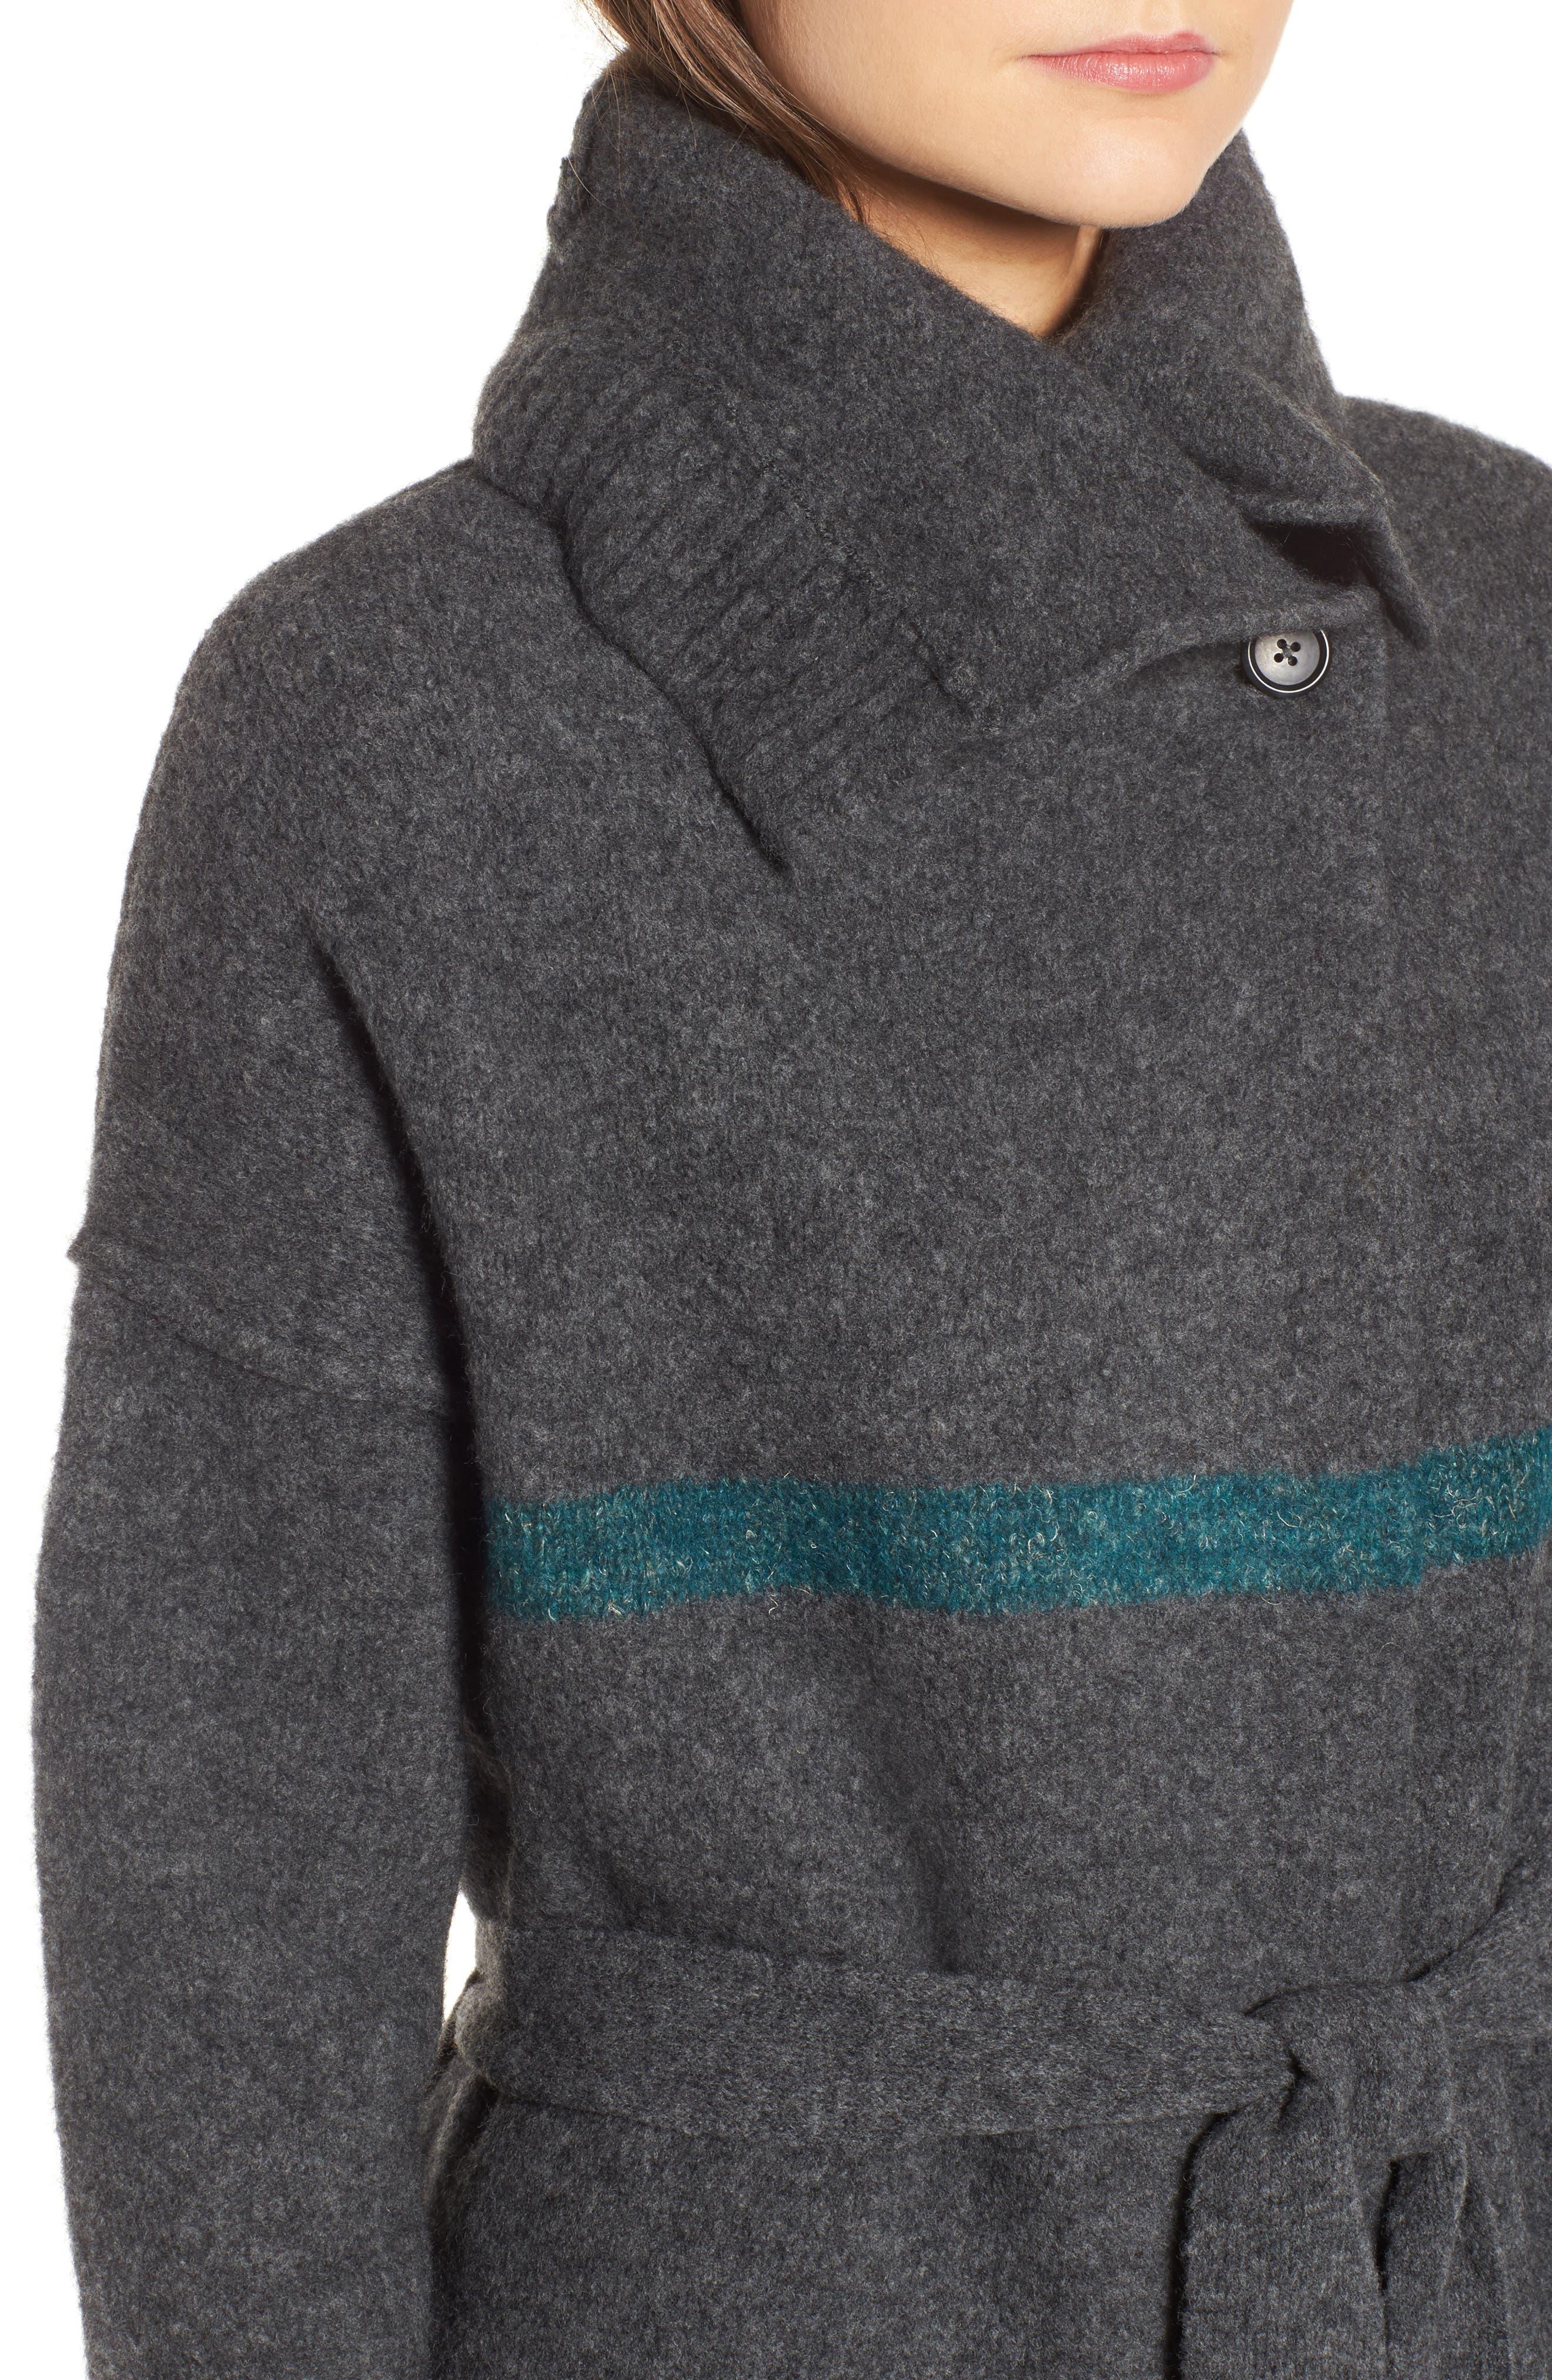 Belted Blanket Stripe Coat,                             Alternate thumbnail 4, color,                             209